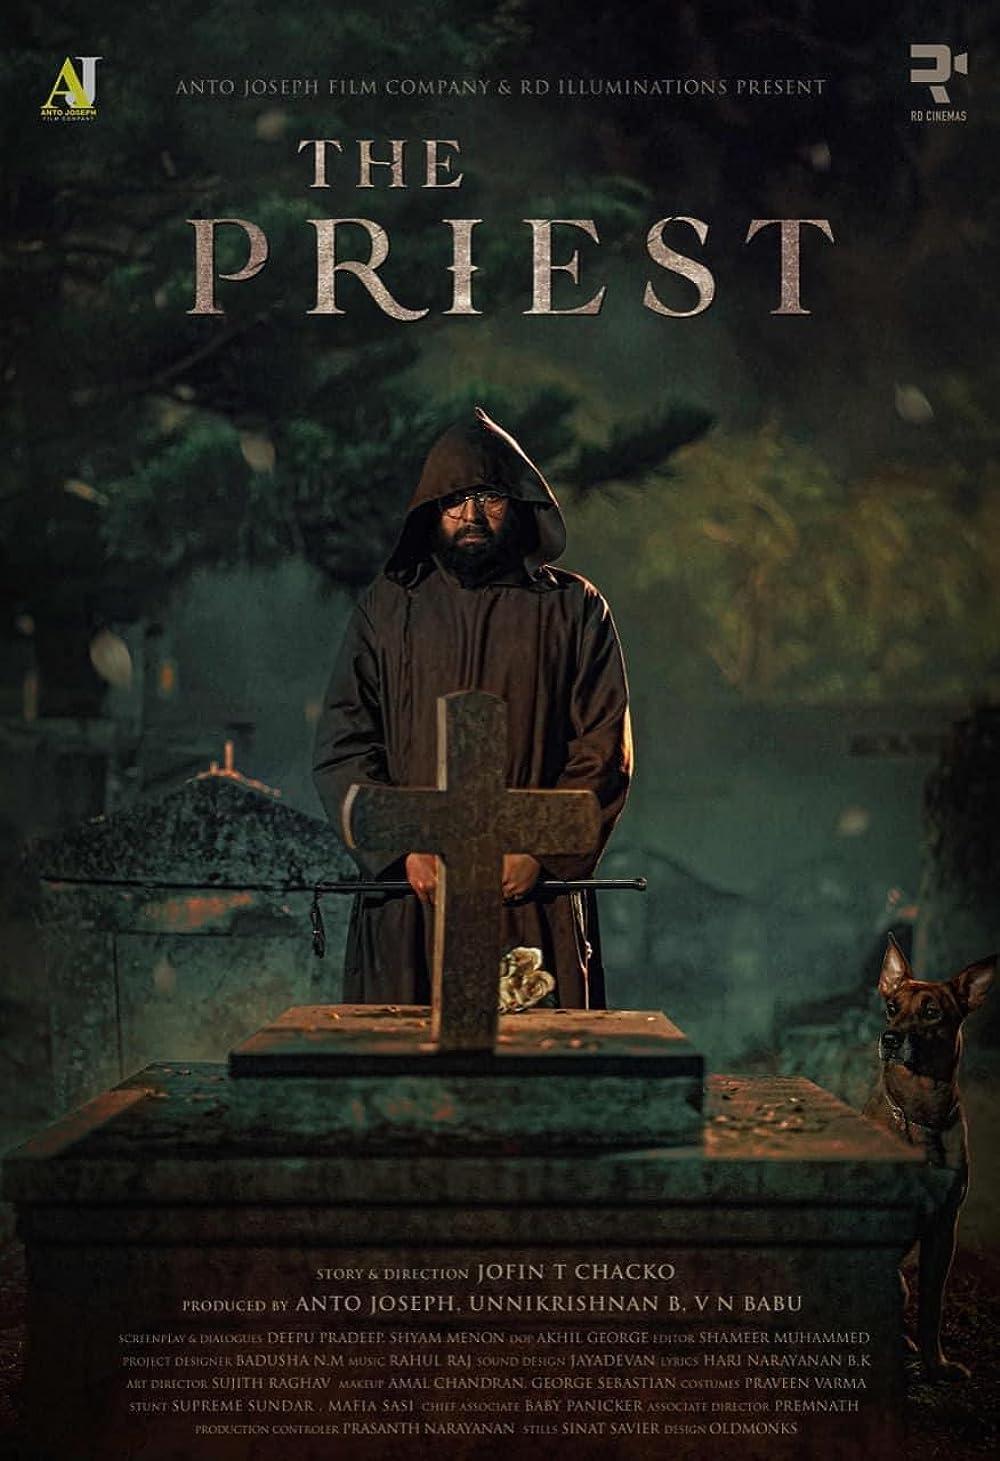 The Priest 2021 Telugu 480p AMZN HDRip ESub 450MB Download